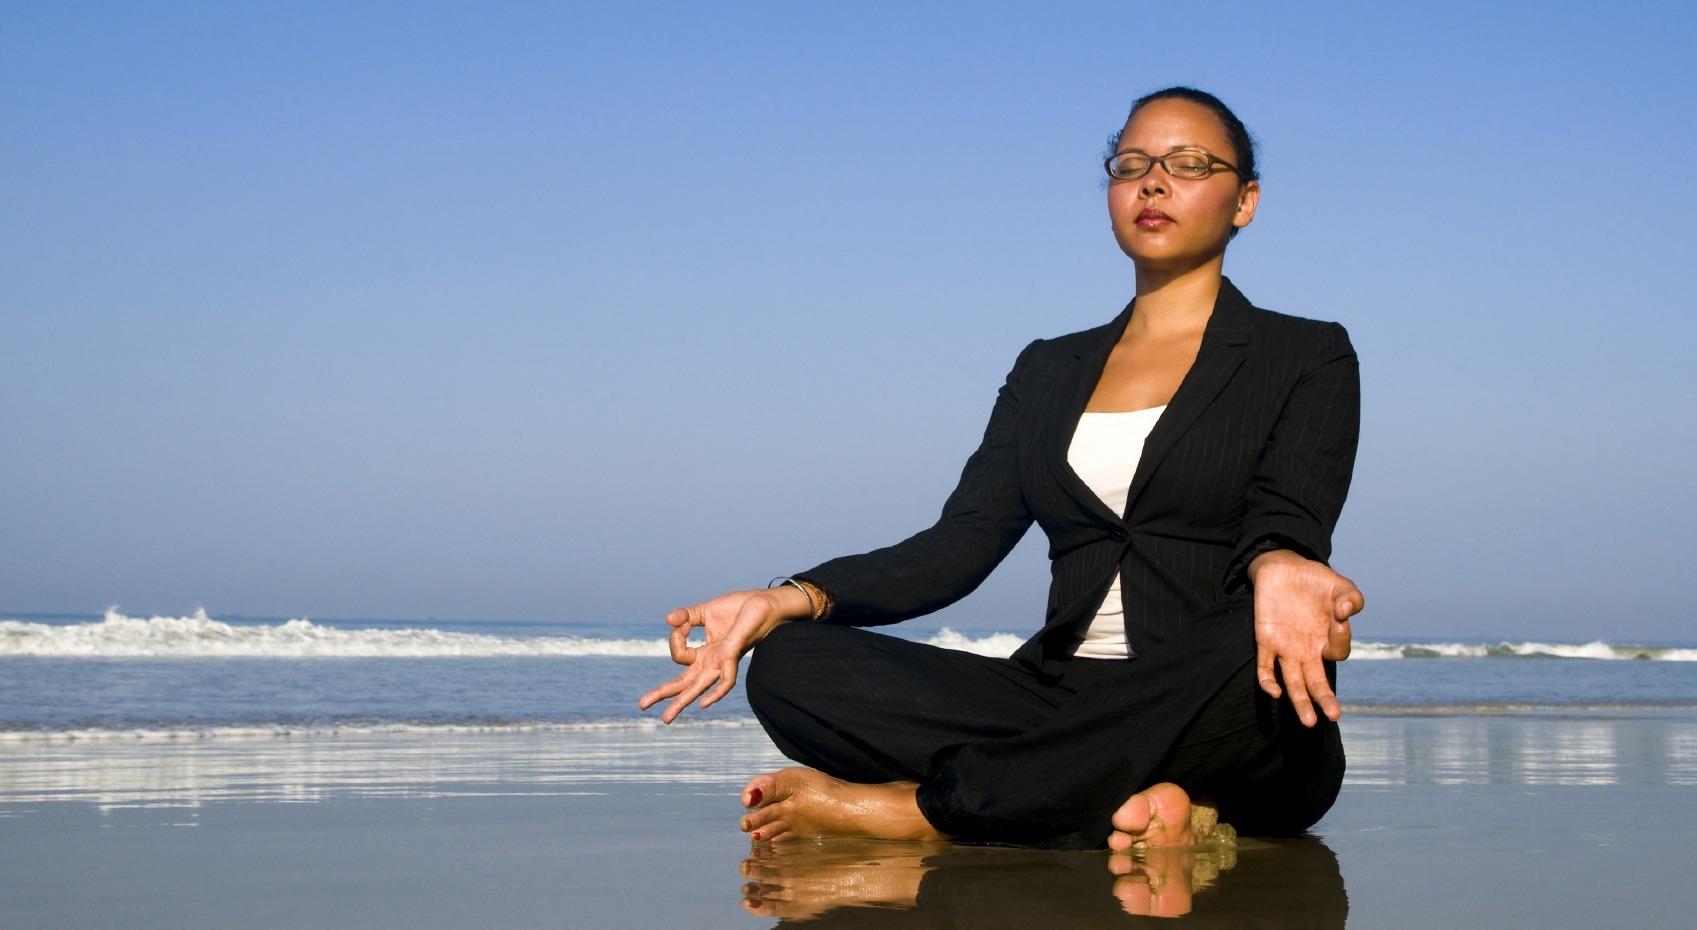 9woman_meditating - Copy.jpg